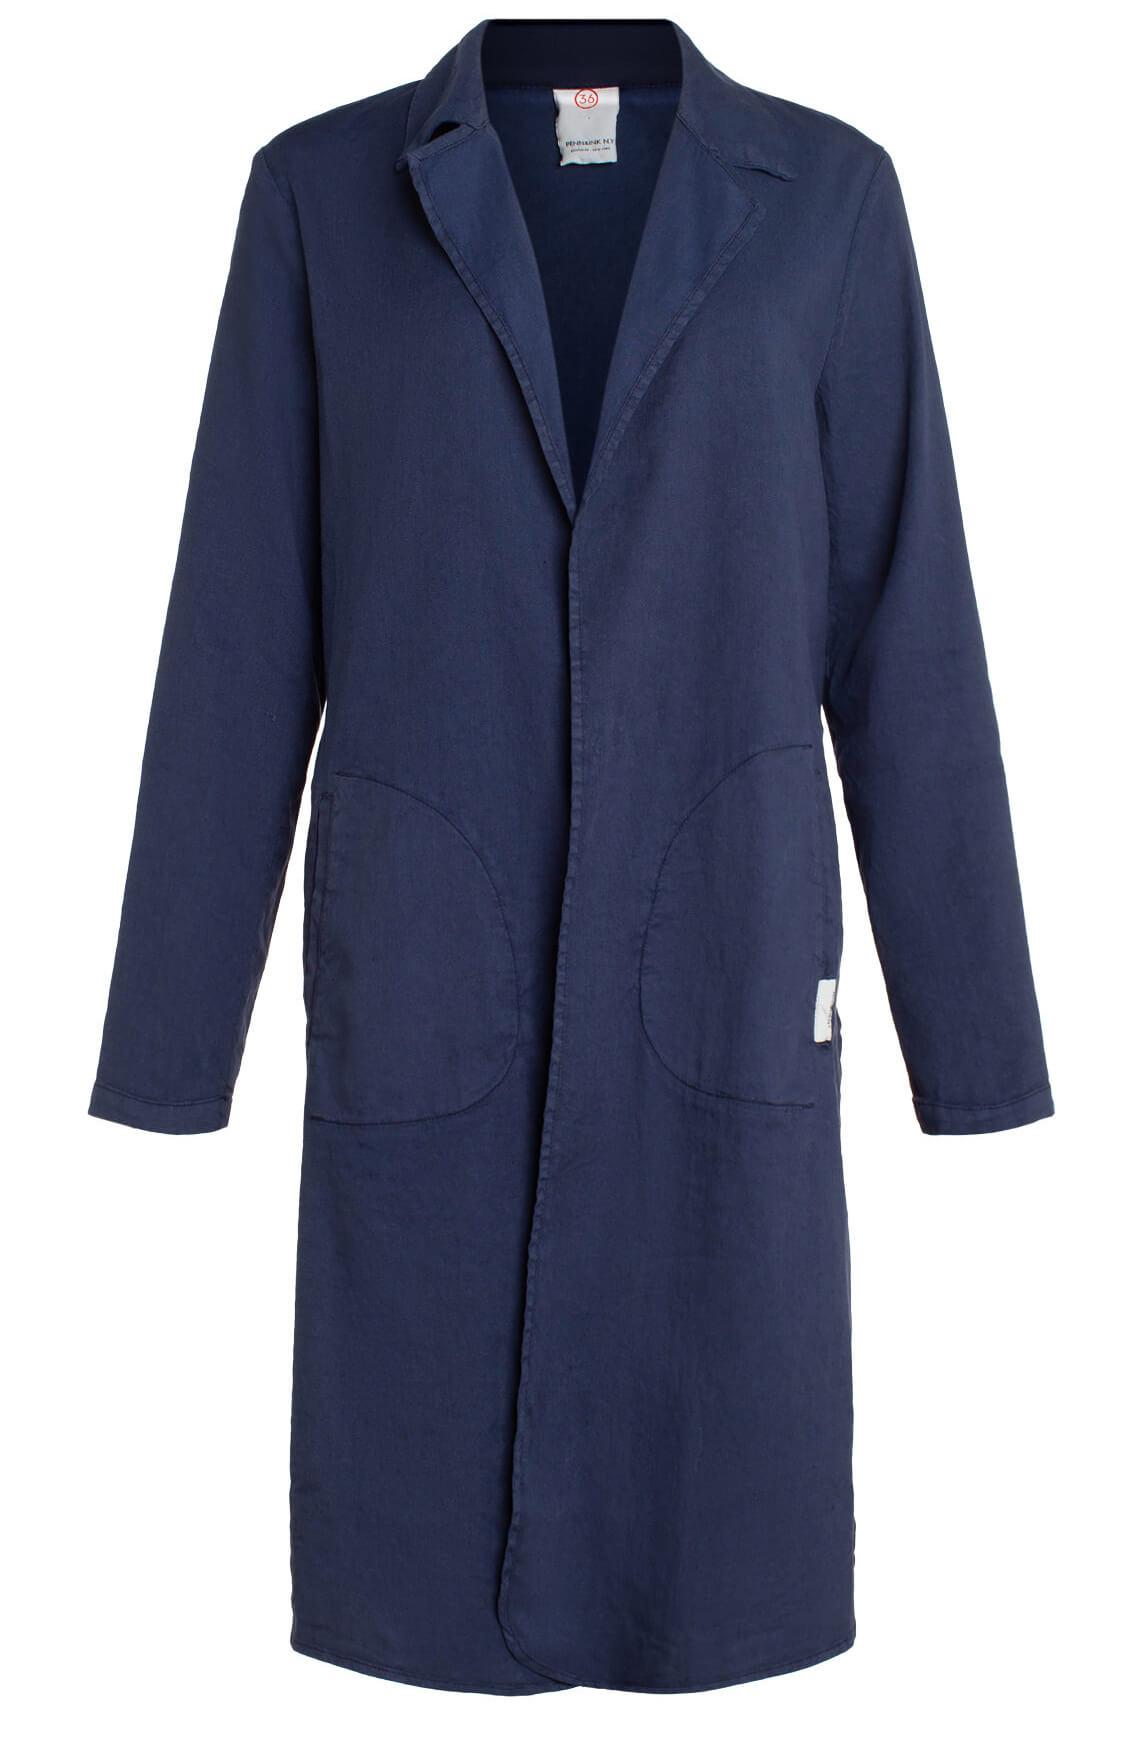 Penn & Ink Dames Materiaalmix blazerjas Blauw